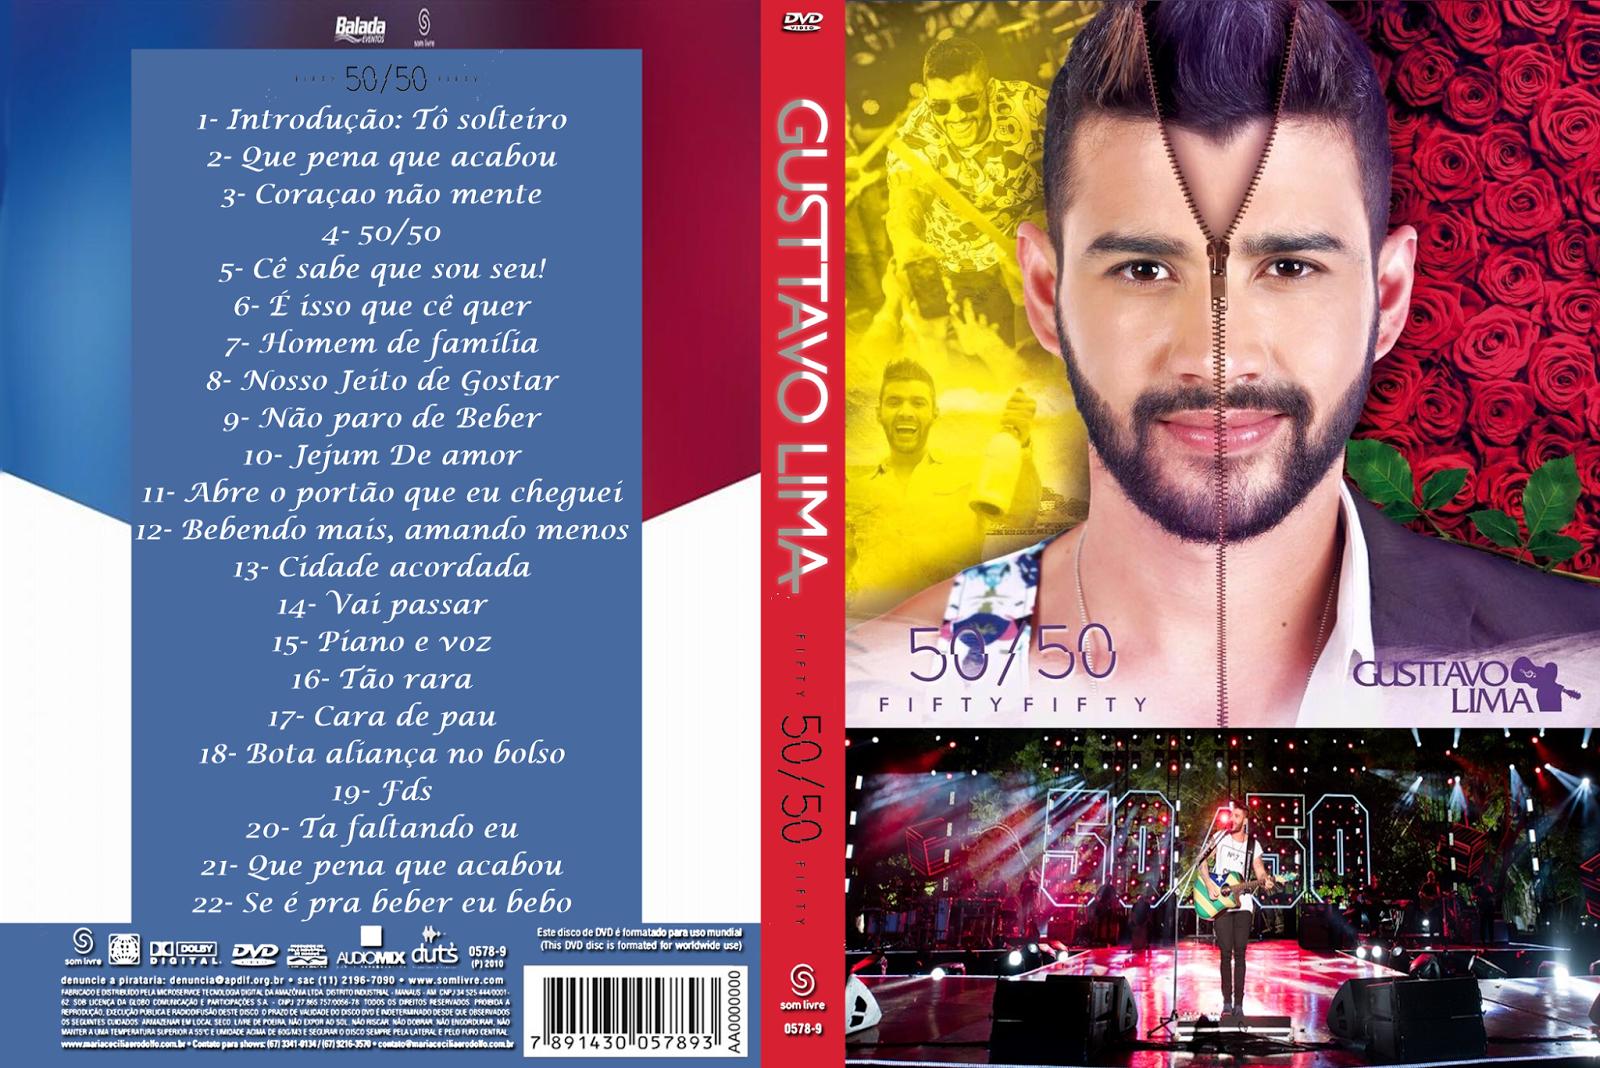 Gusttavo Lima 50/50 DVDRip 2016 Gustavo 2BLima 2B50 50 2B 25282016 2529